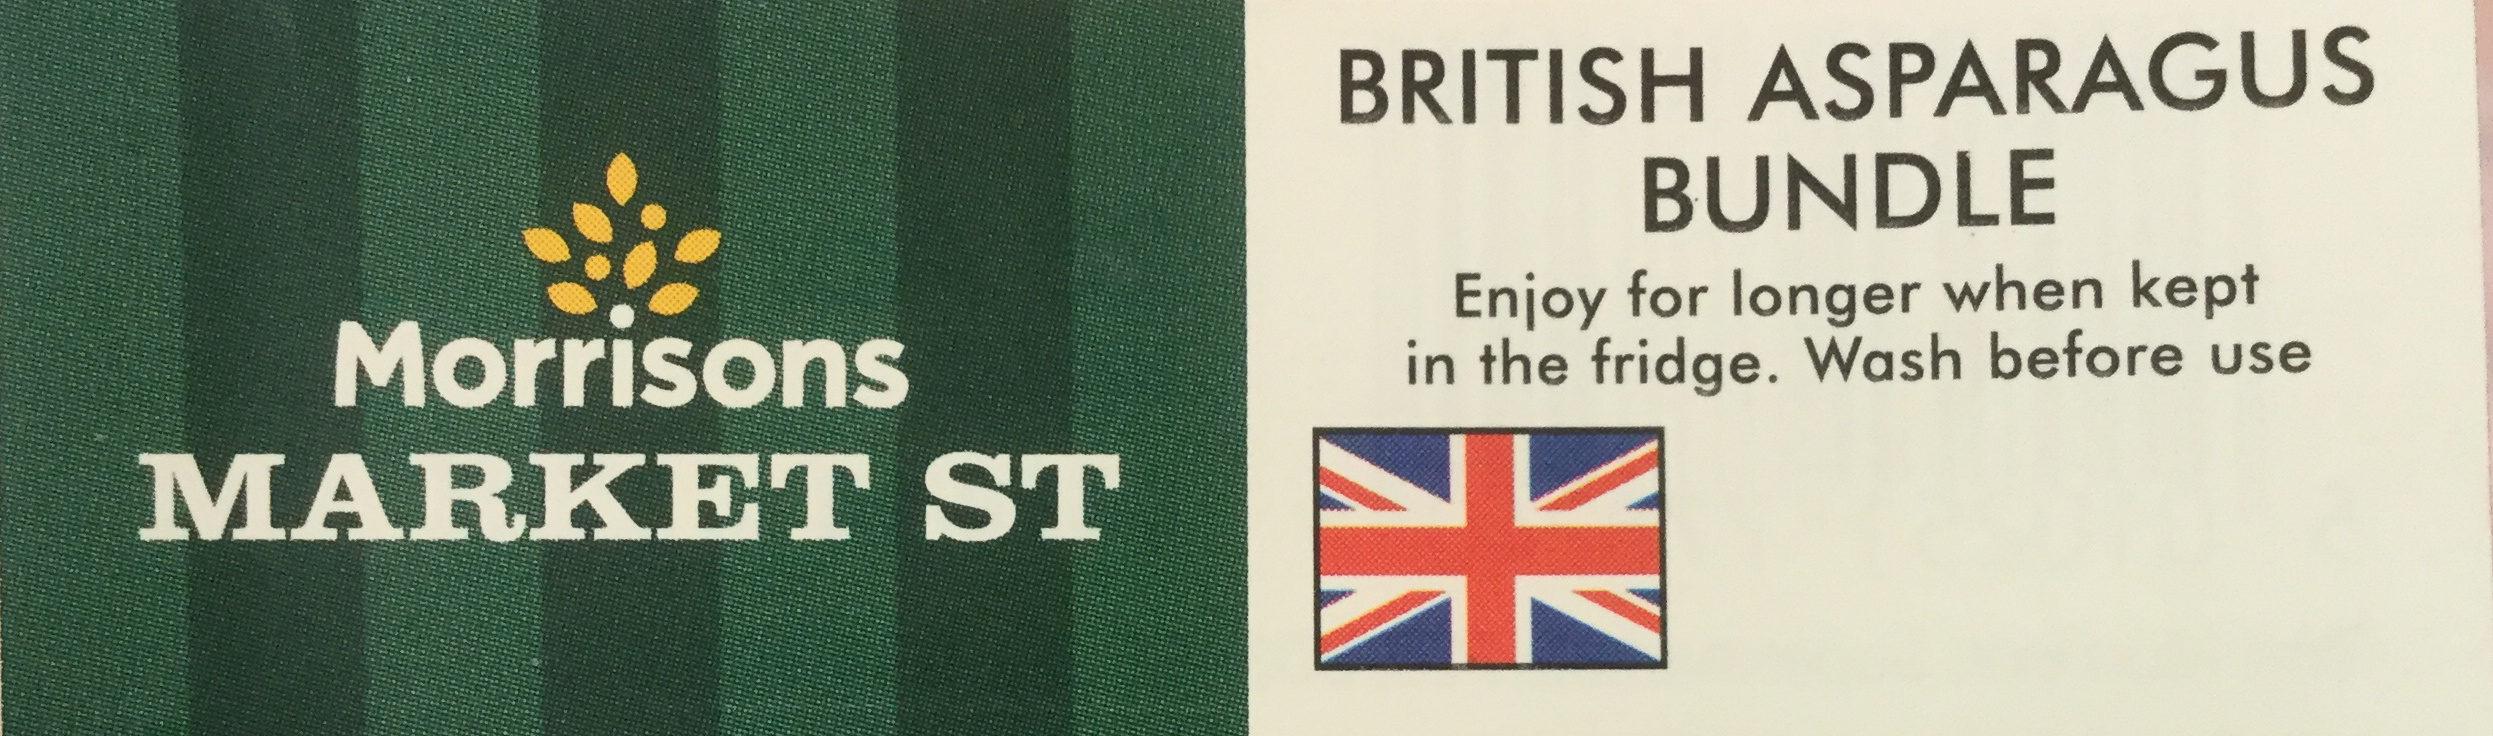 British Asparagus bundle - Product